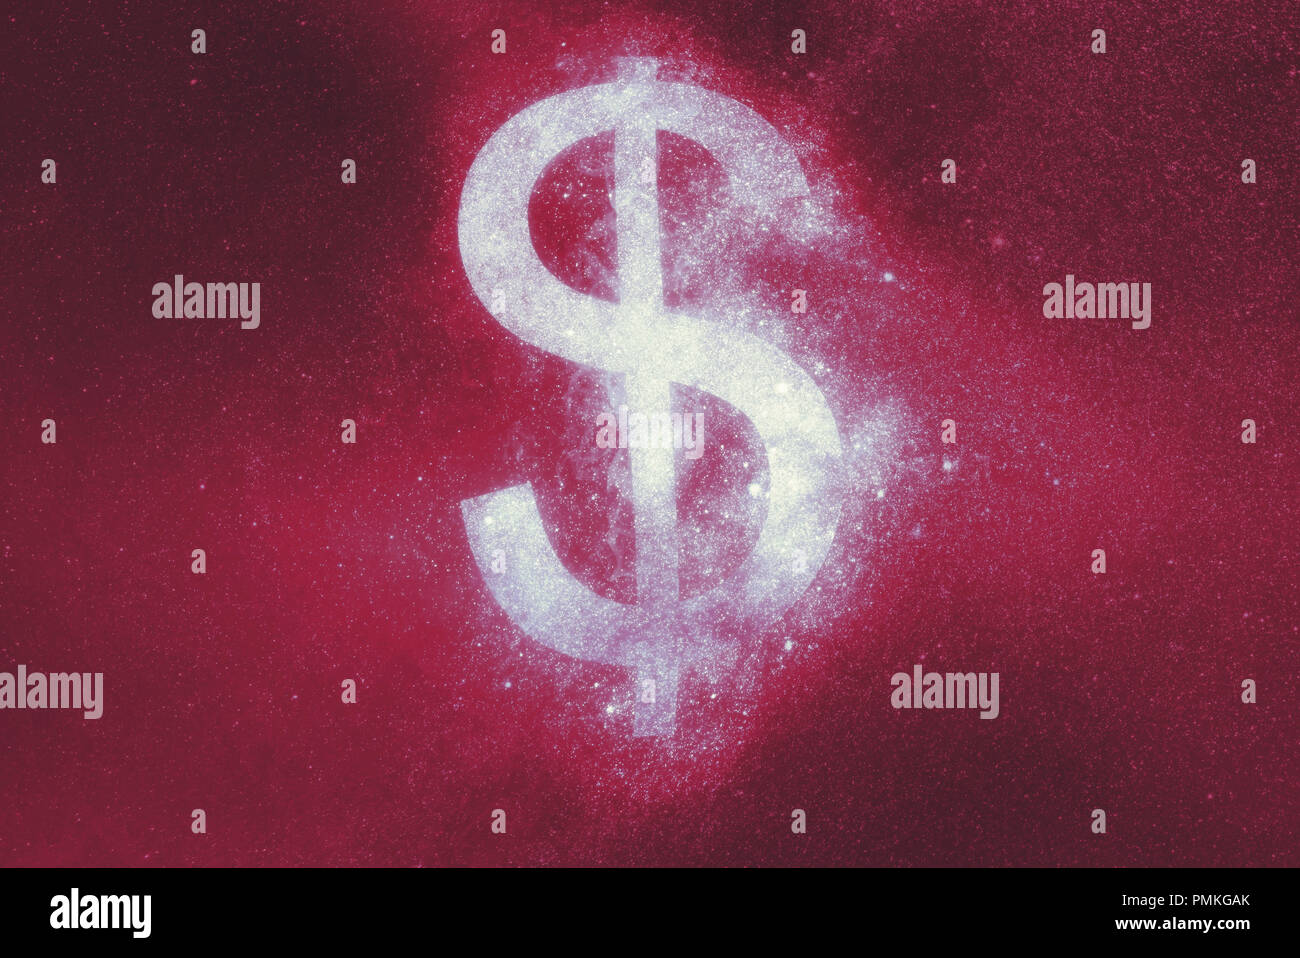 Signo de dólar, símbolo de dólar. Resumen Antecedentes Imagen De Stock